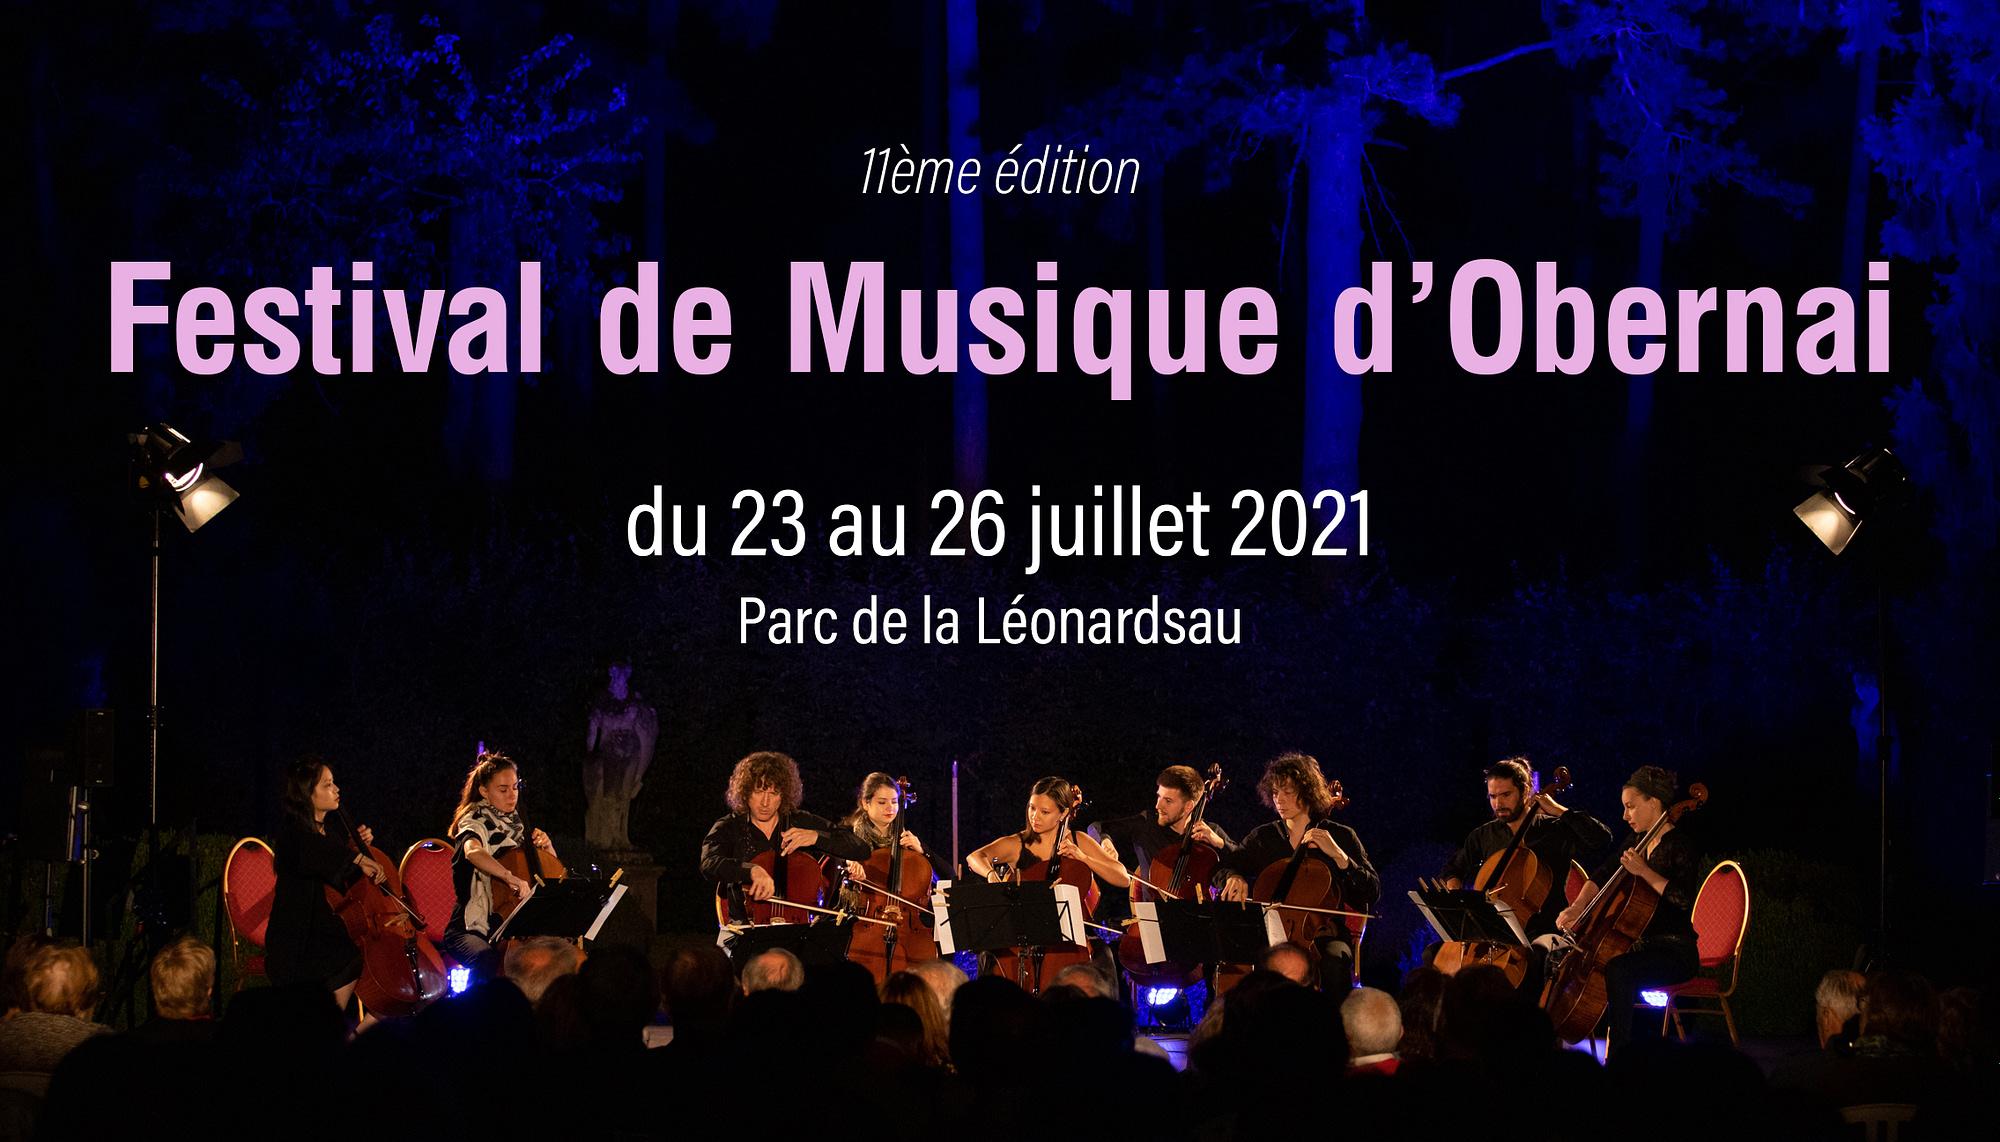 festival de musique obernai 2021